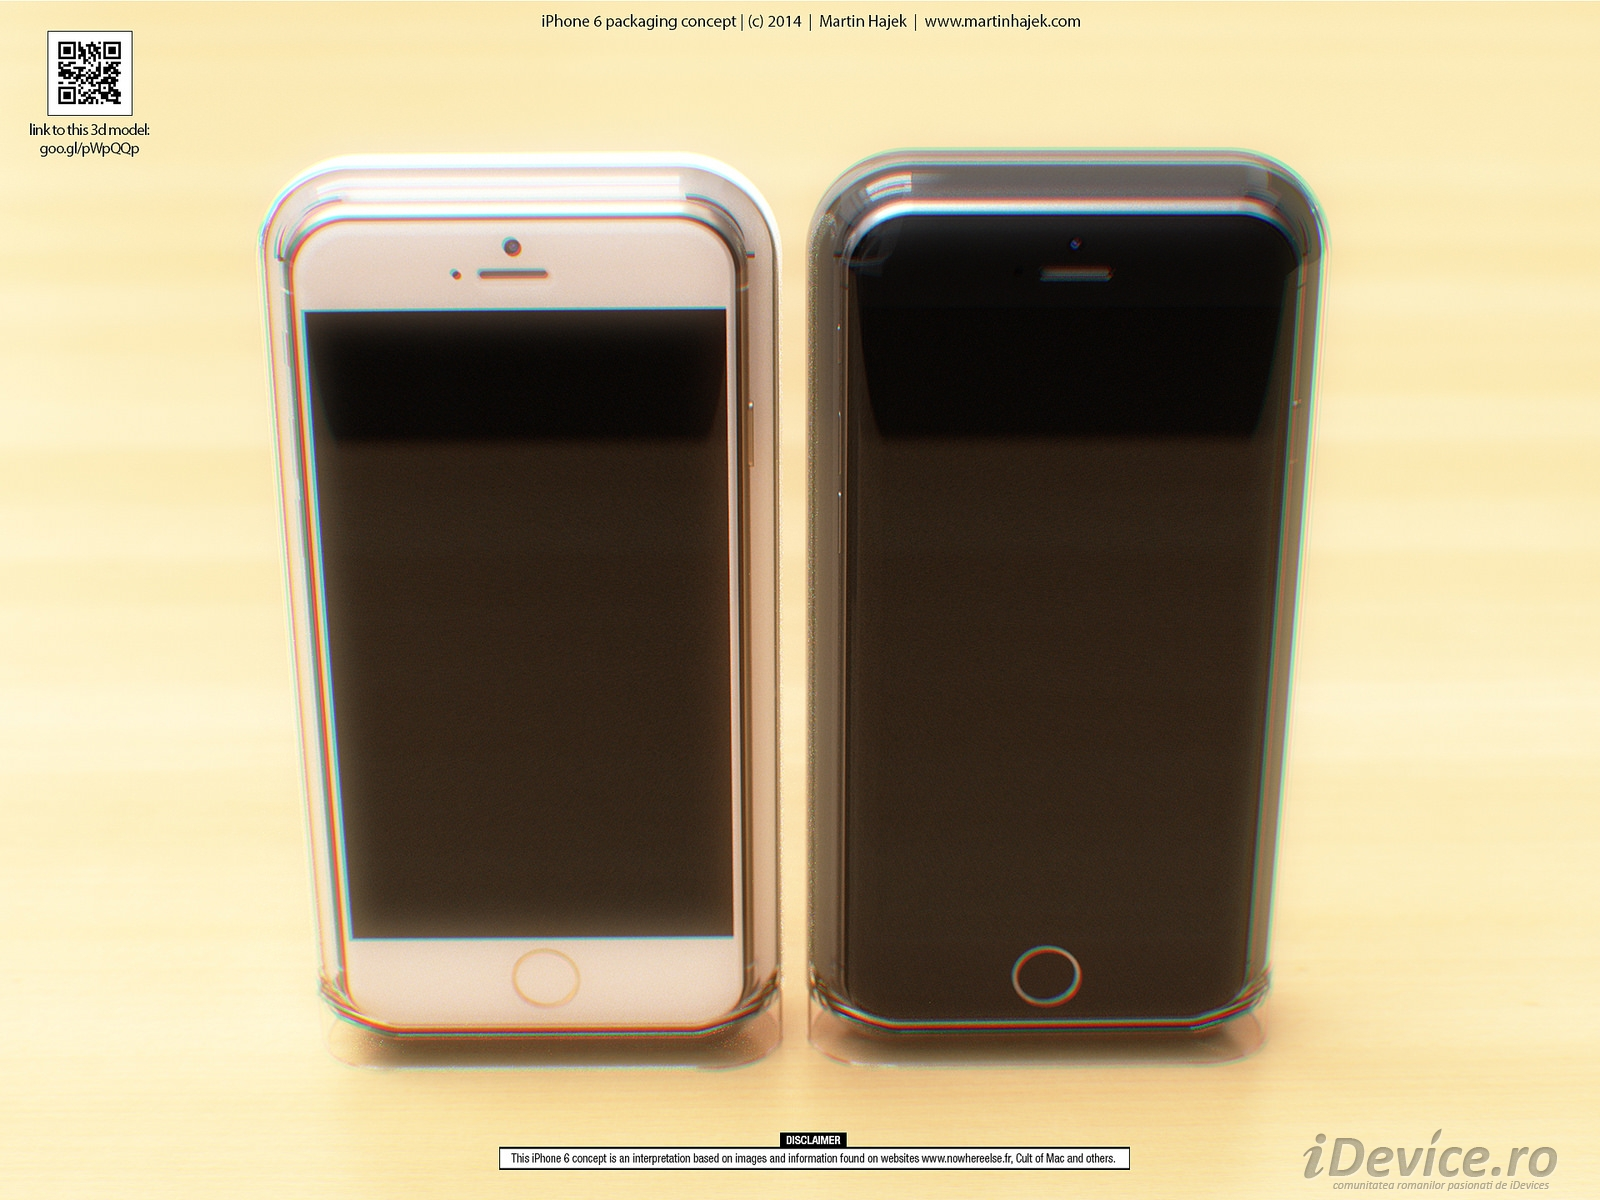 iPhone 6 ambalaj concept - iDevice.ro 5